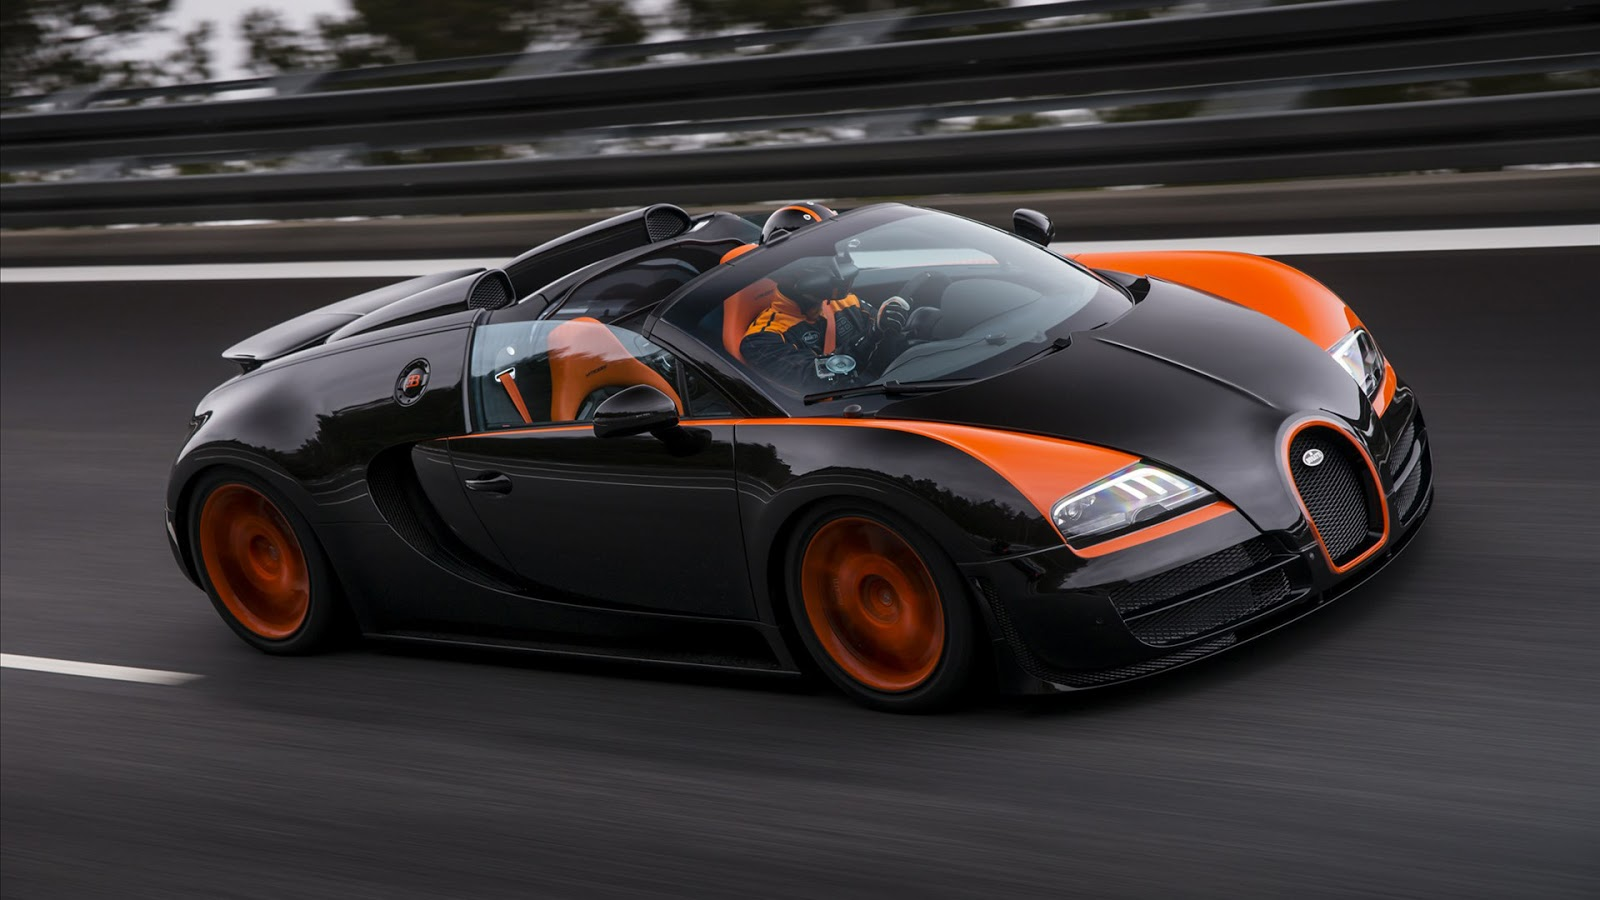 Hd Bugatti Supercar Wallpaper 2   SA Wallpapers 1600x900